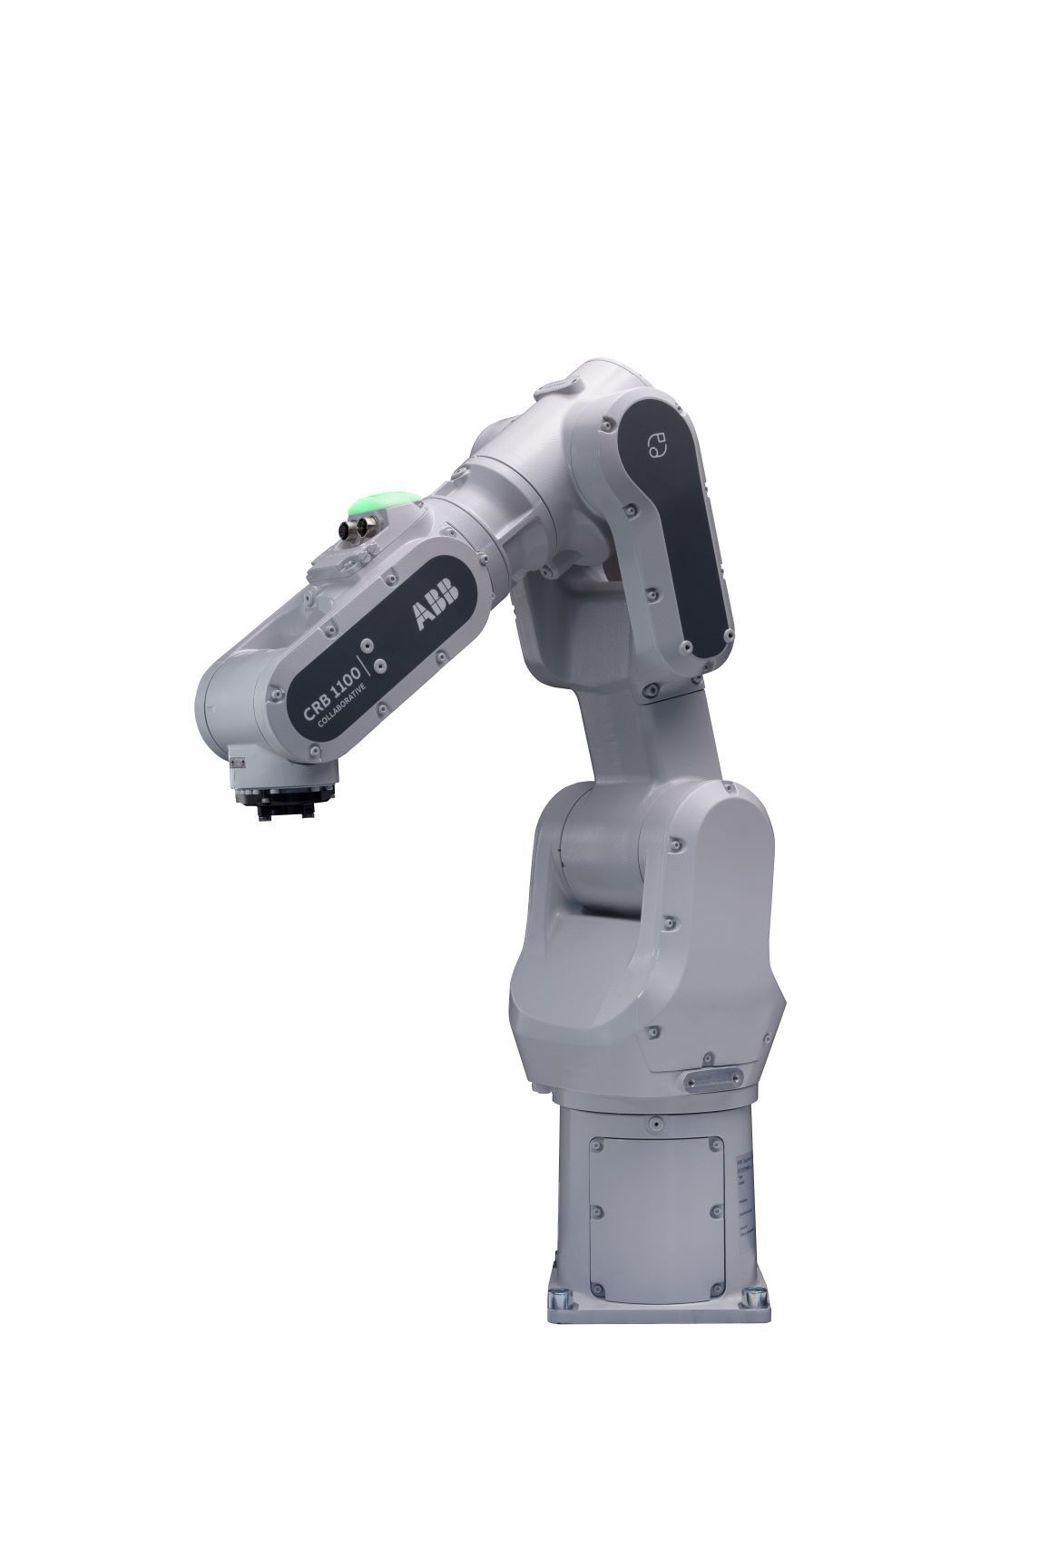 ABB_CRB 1100_SWIFTI協作機器人,實現工業級速度的人機協作。...